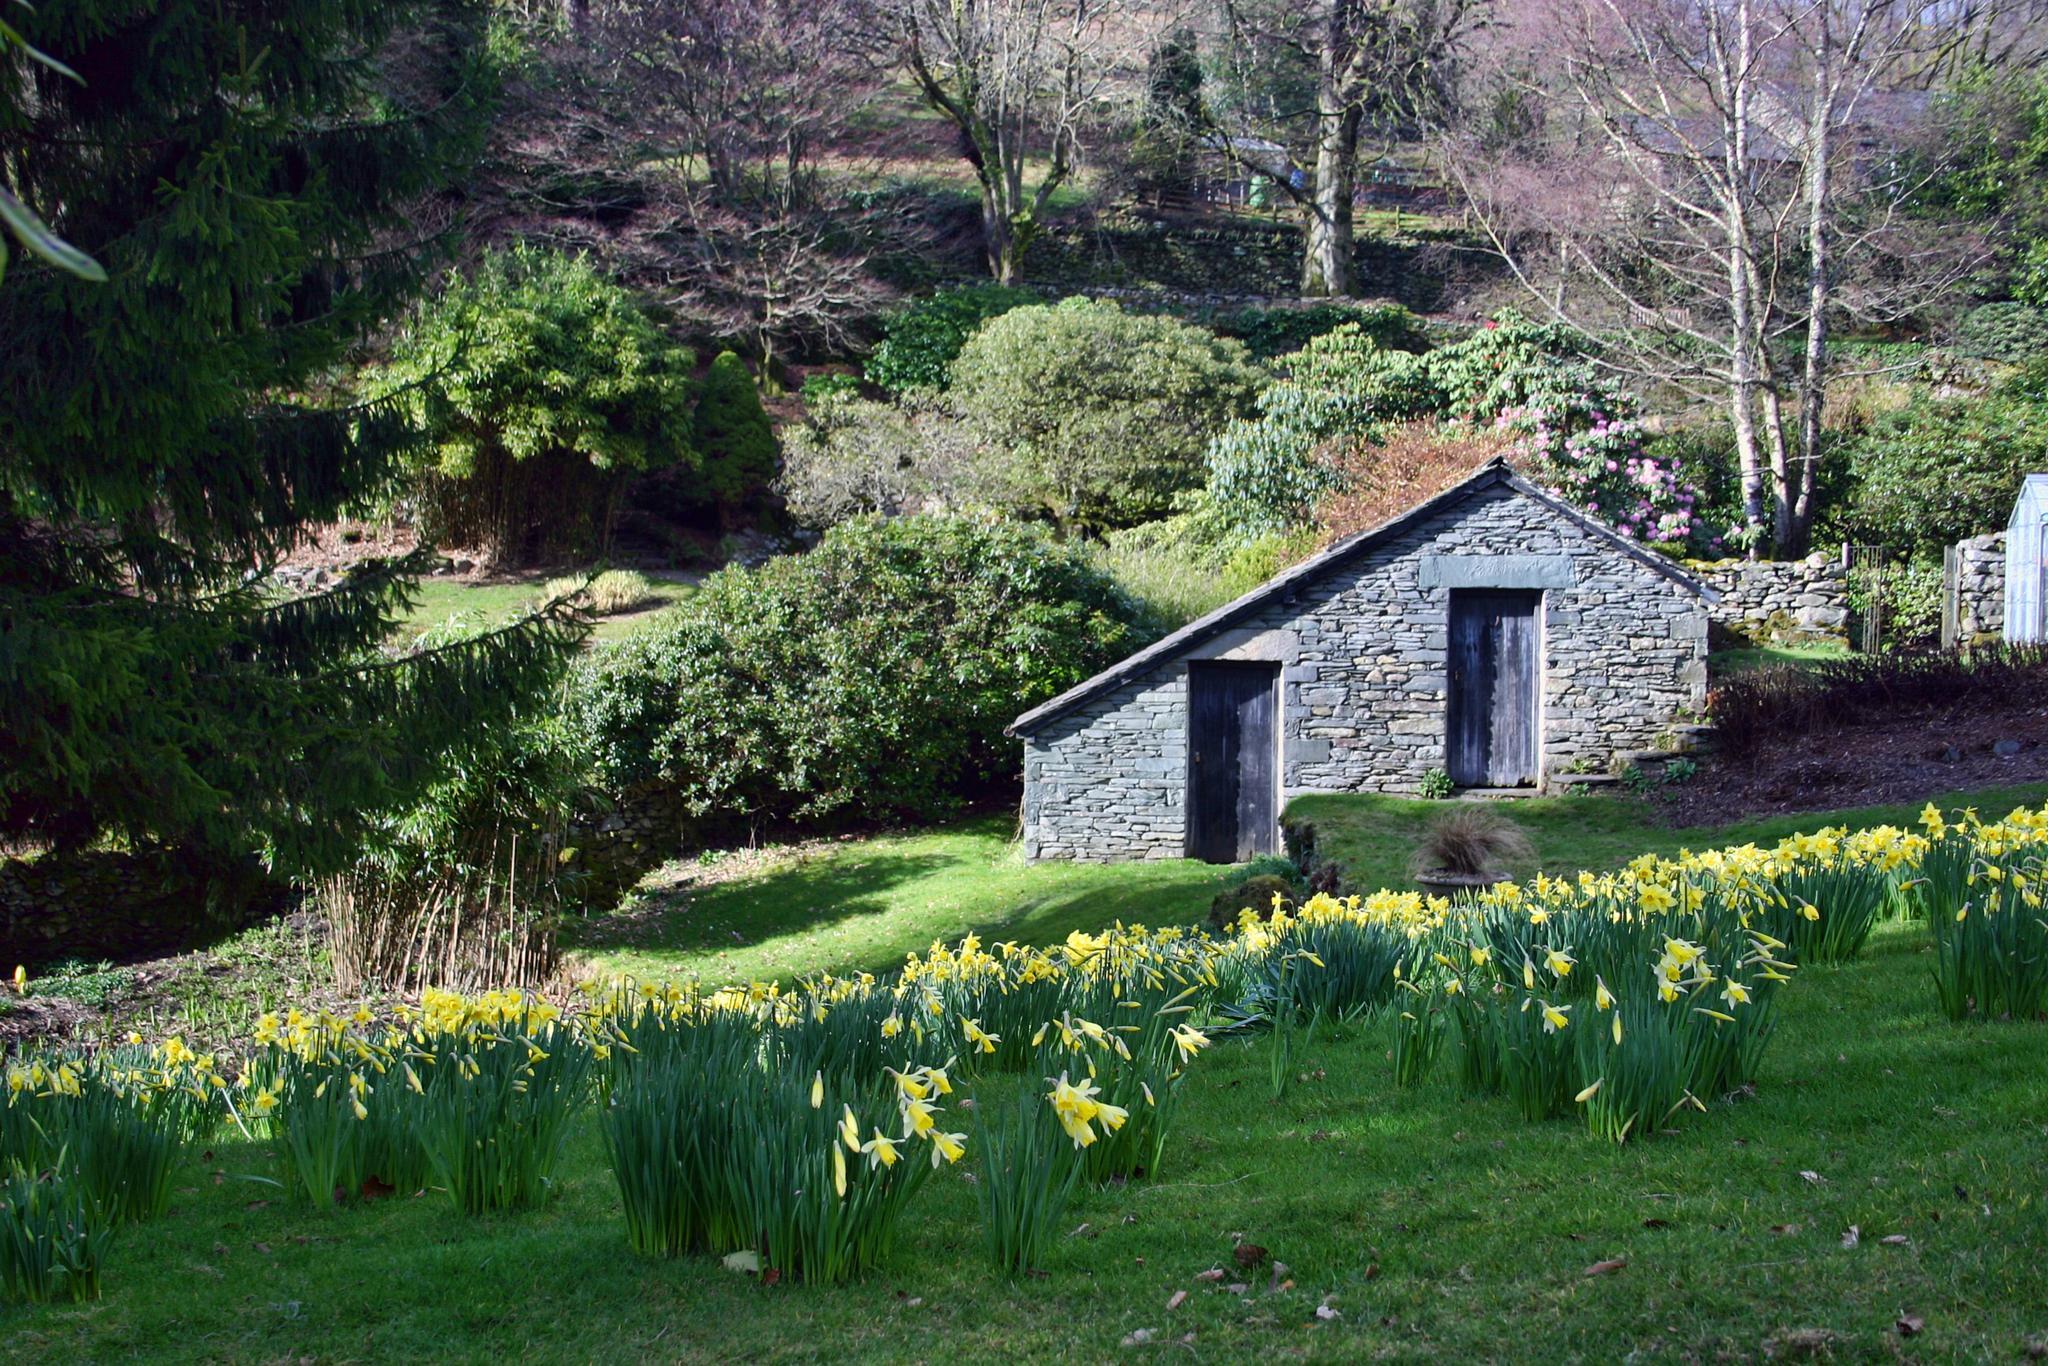 William Wordsworth's garden at Rydal Mount.  Cumbria.  UK. by geofftodhunter